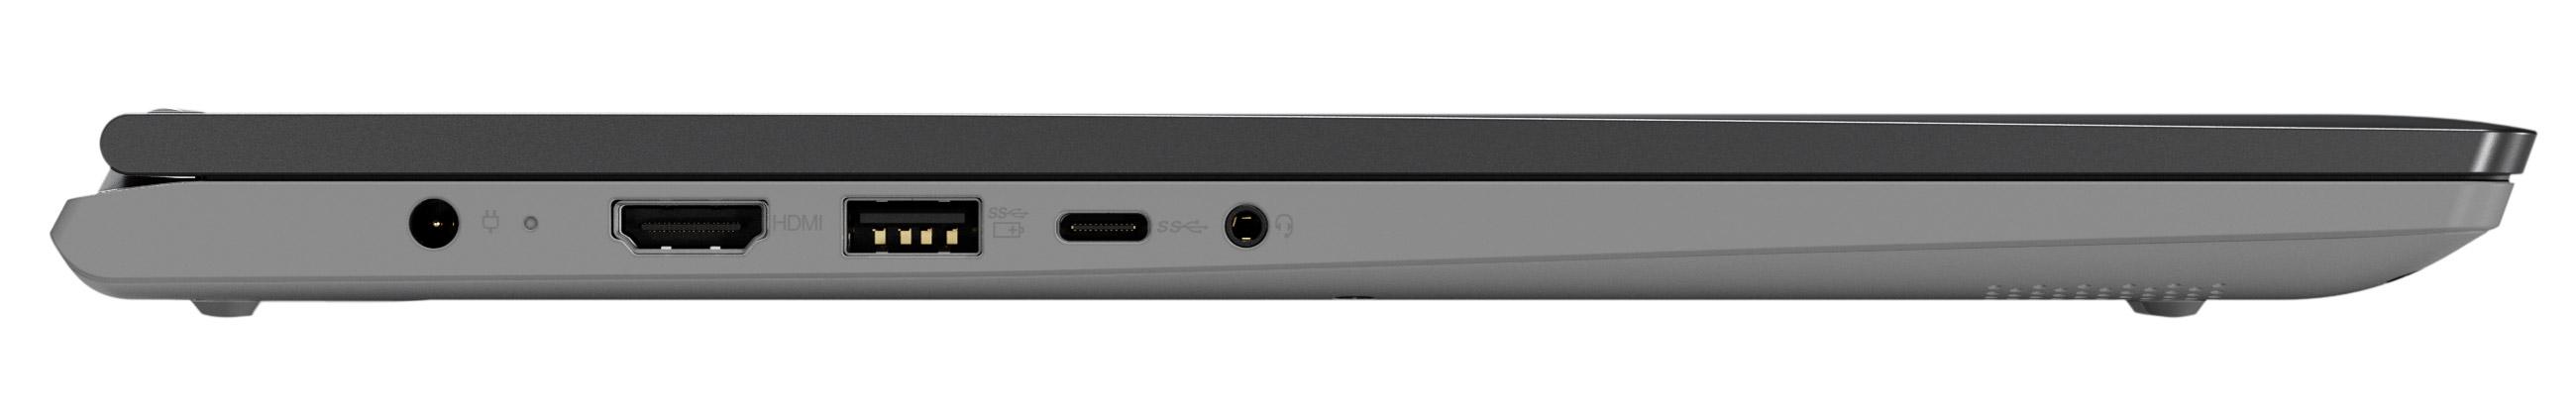 Фото  Ультрабук Lenovo Yoga 530 Onyx Black (81EK00KPRA)